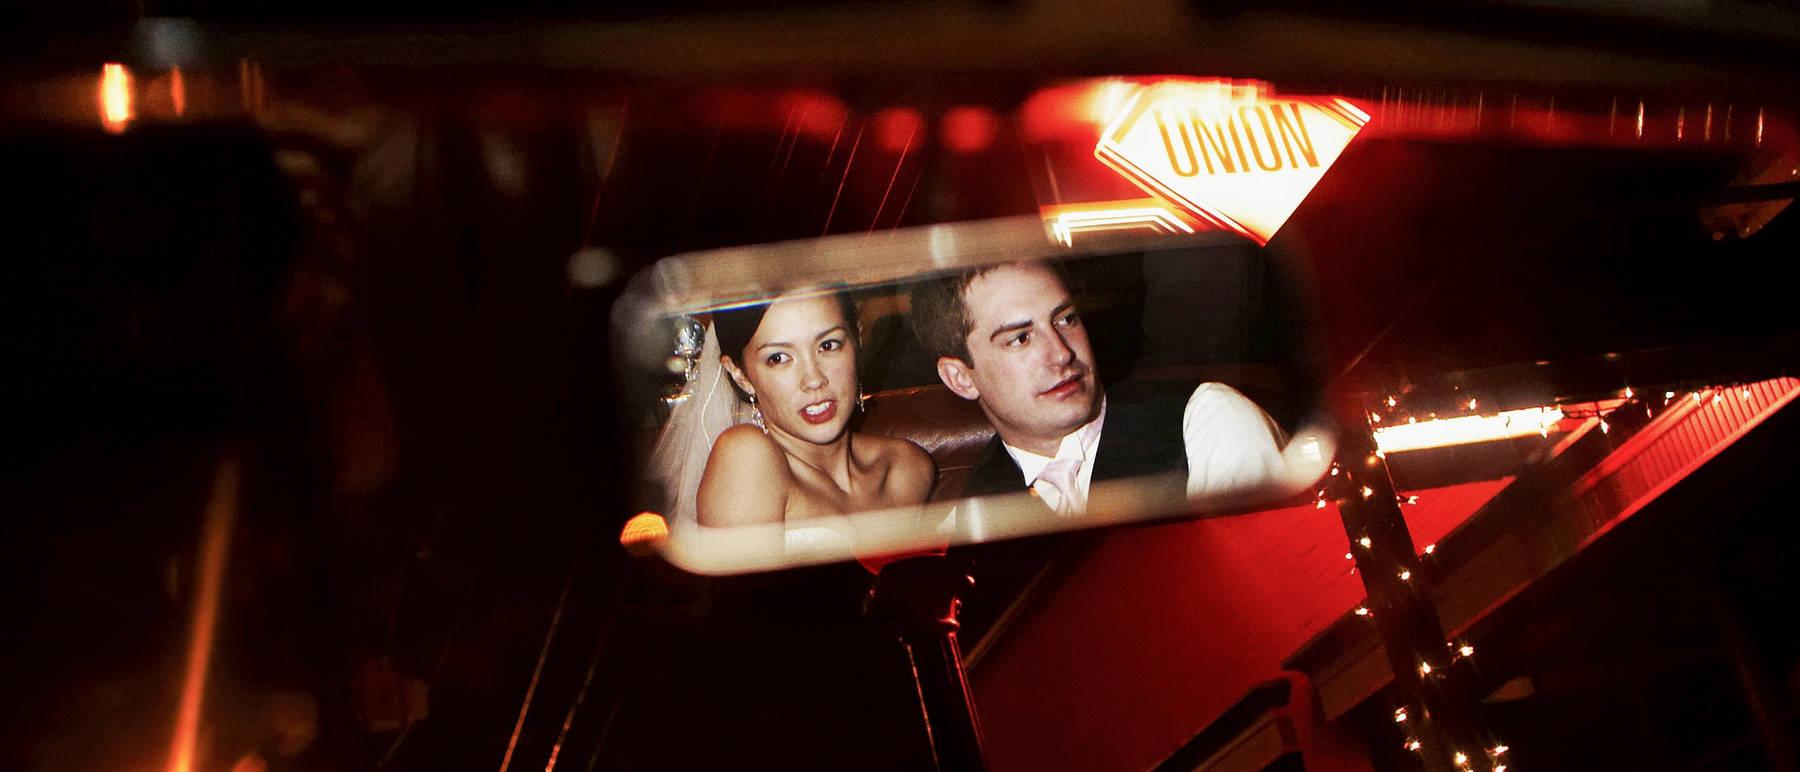 johnandjoseph-wedding-photographer-hz-slider-164